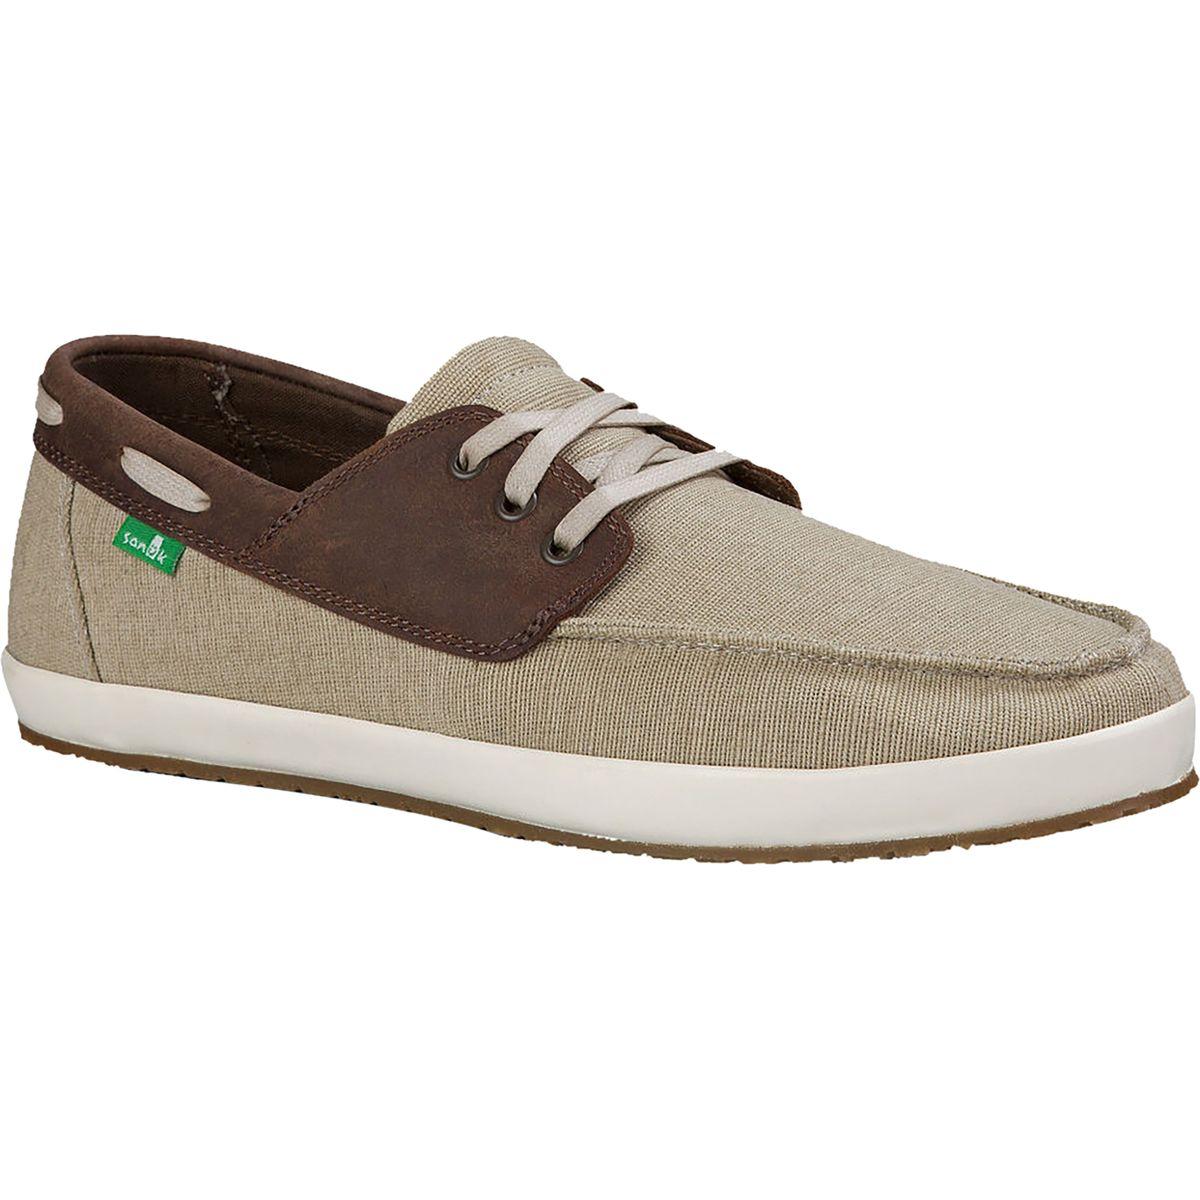 Sanuk Casa Barco Vintage Shoe - Men's